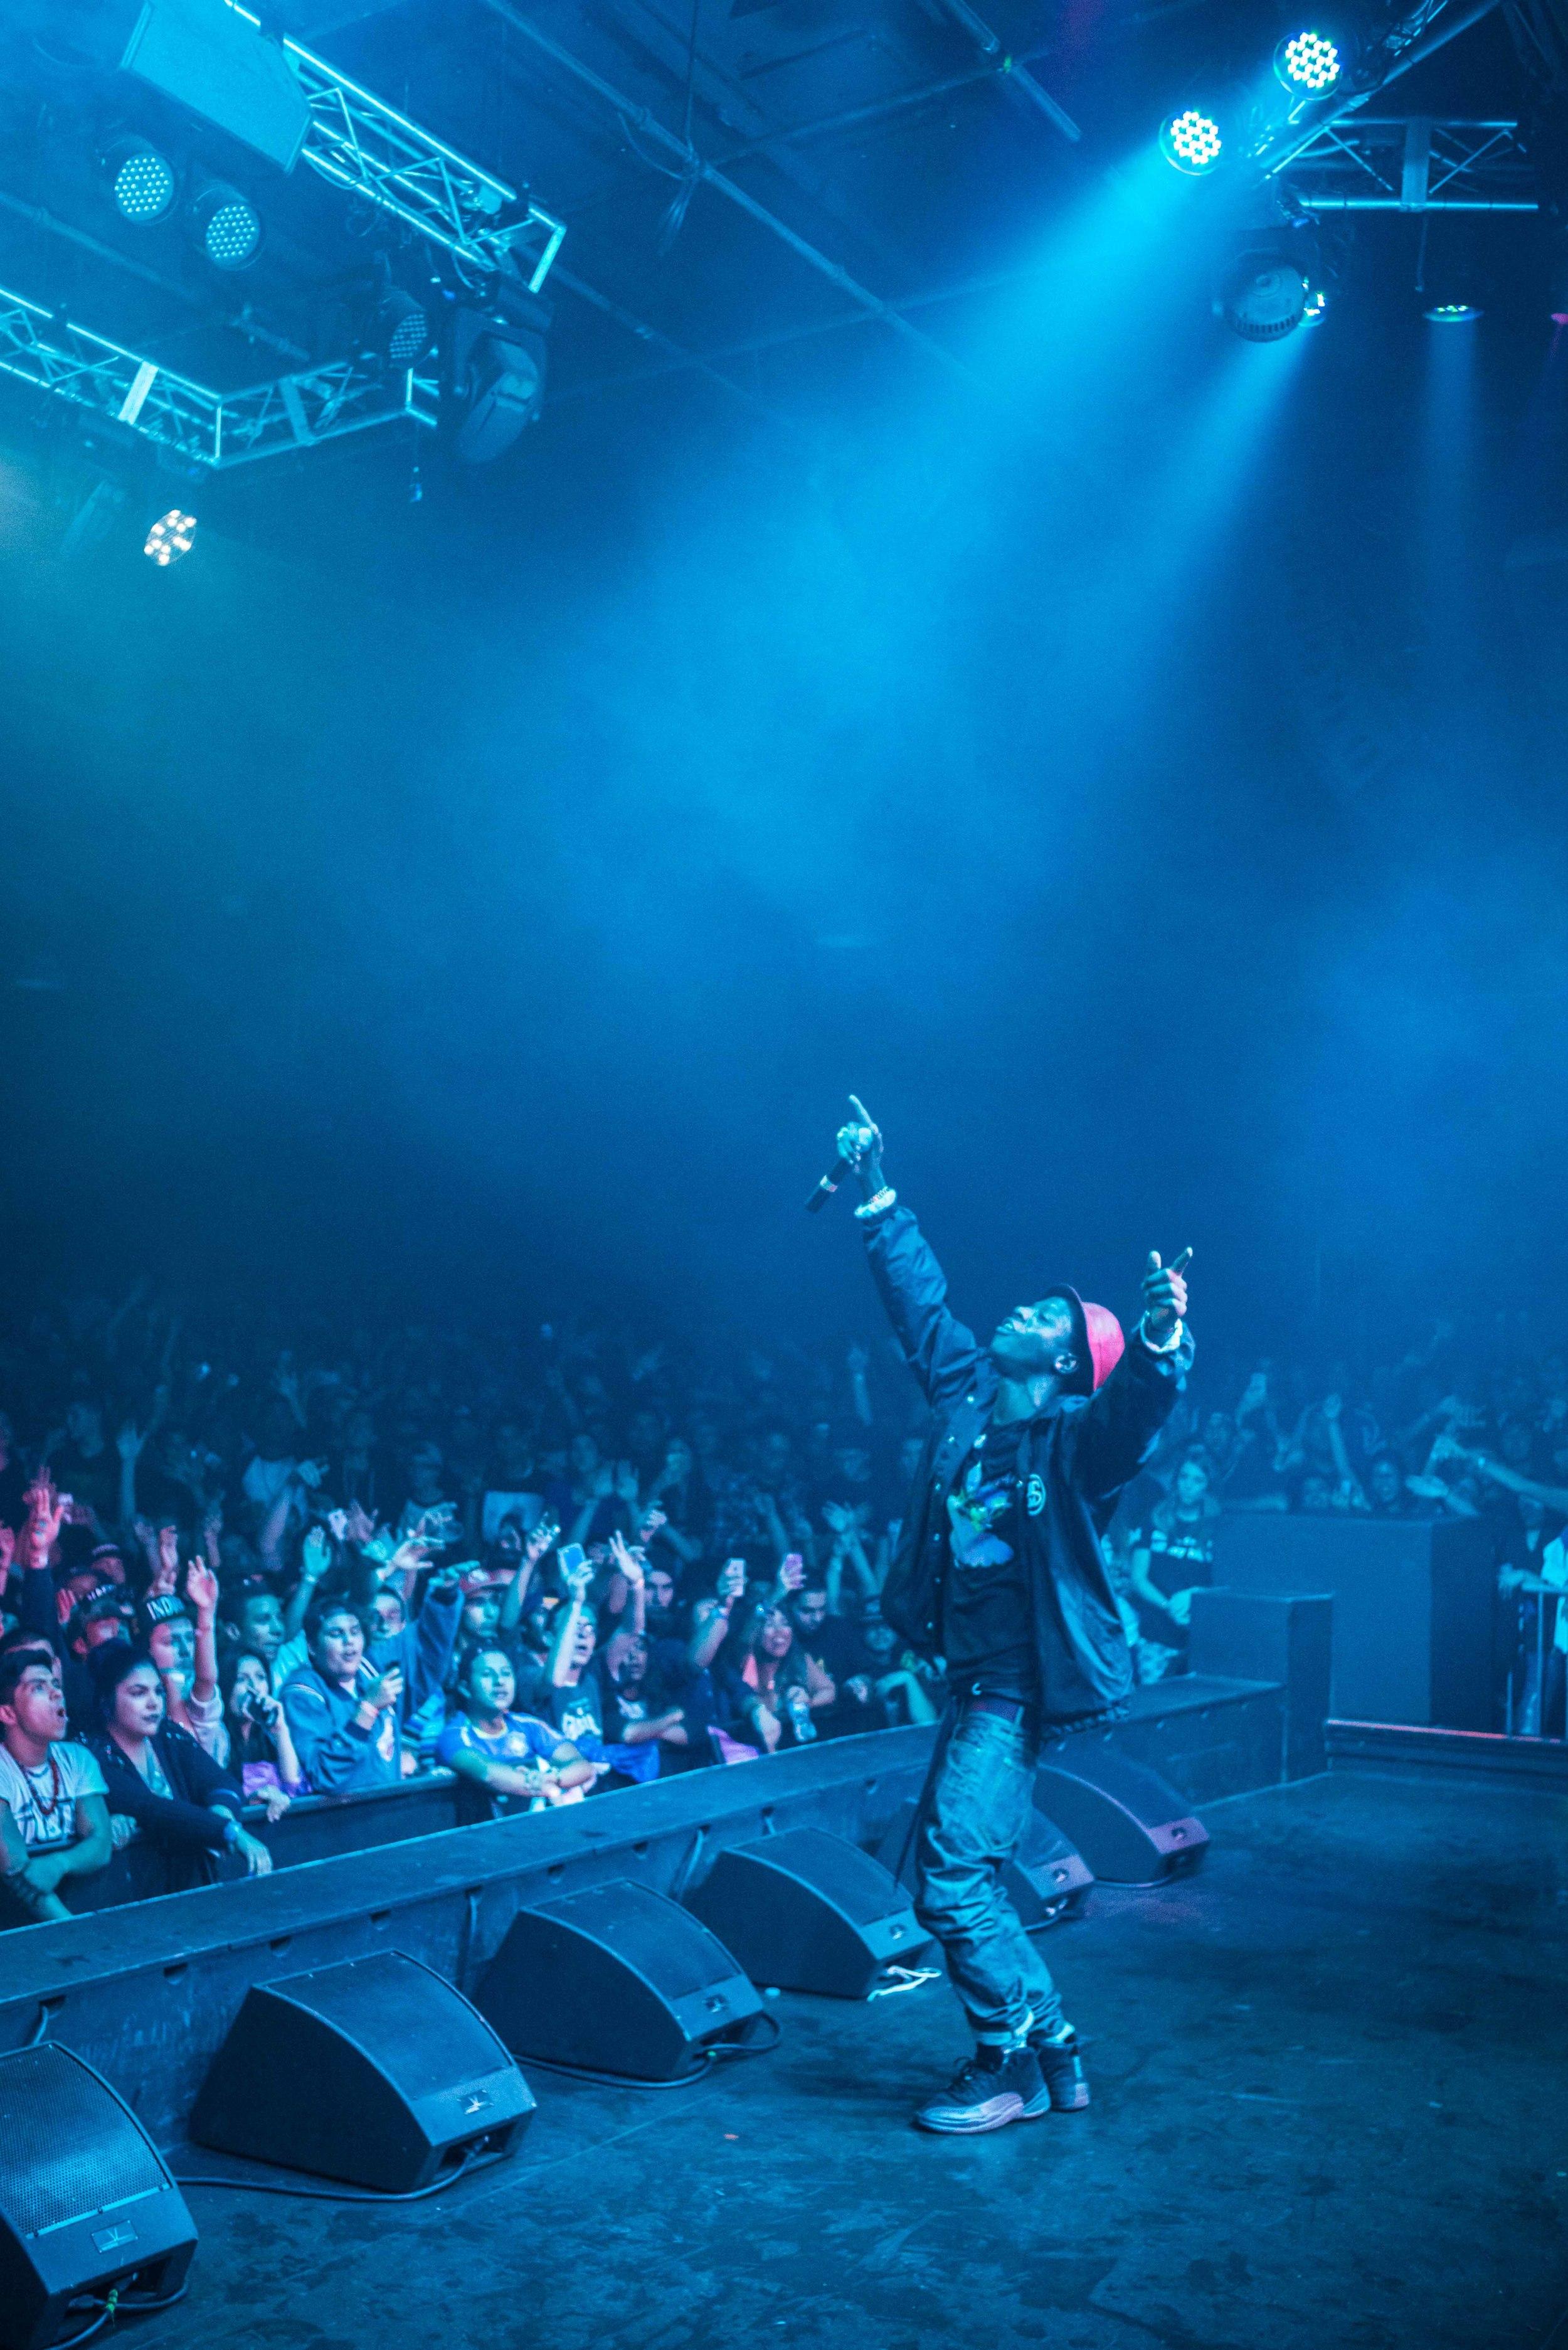 Joey Badass @ The Smoker's Club Tour